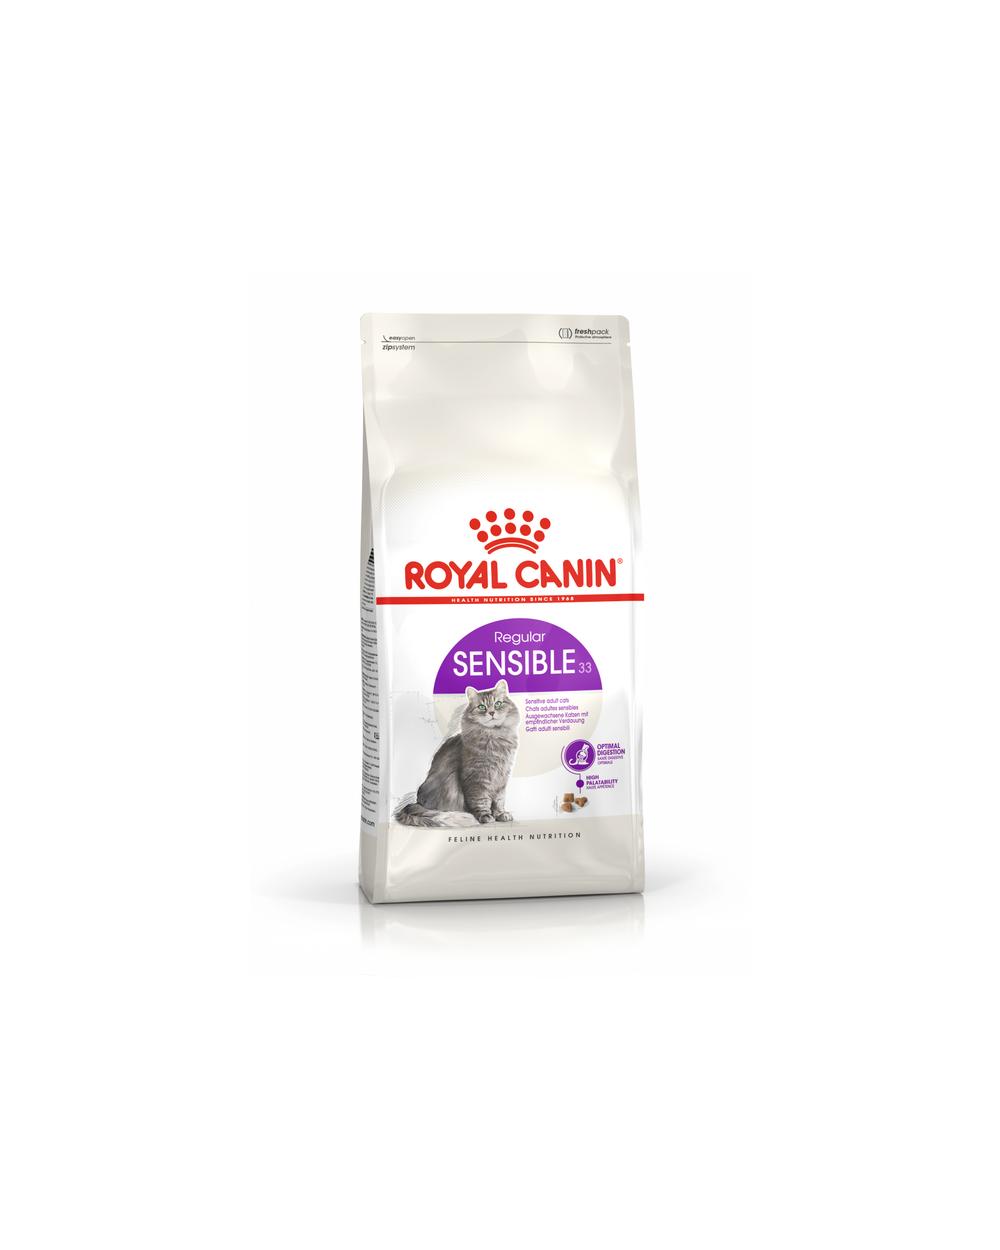 Royal Canin Feline Health Nutrition Regular Sensible 33 - 400 g